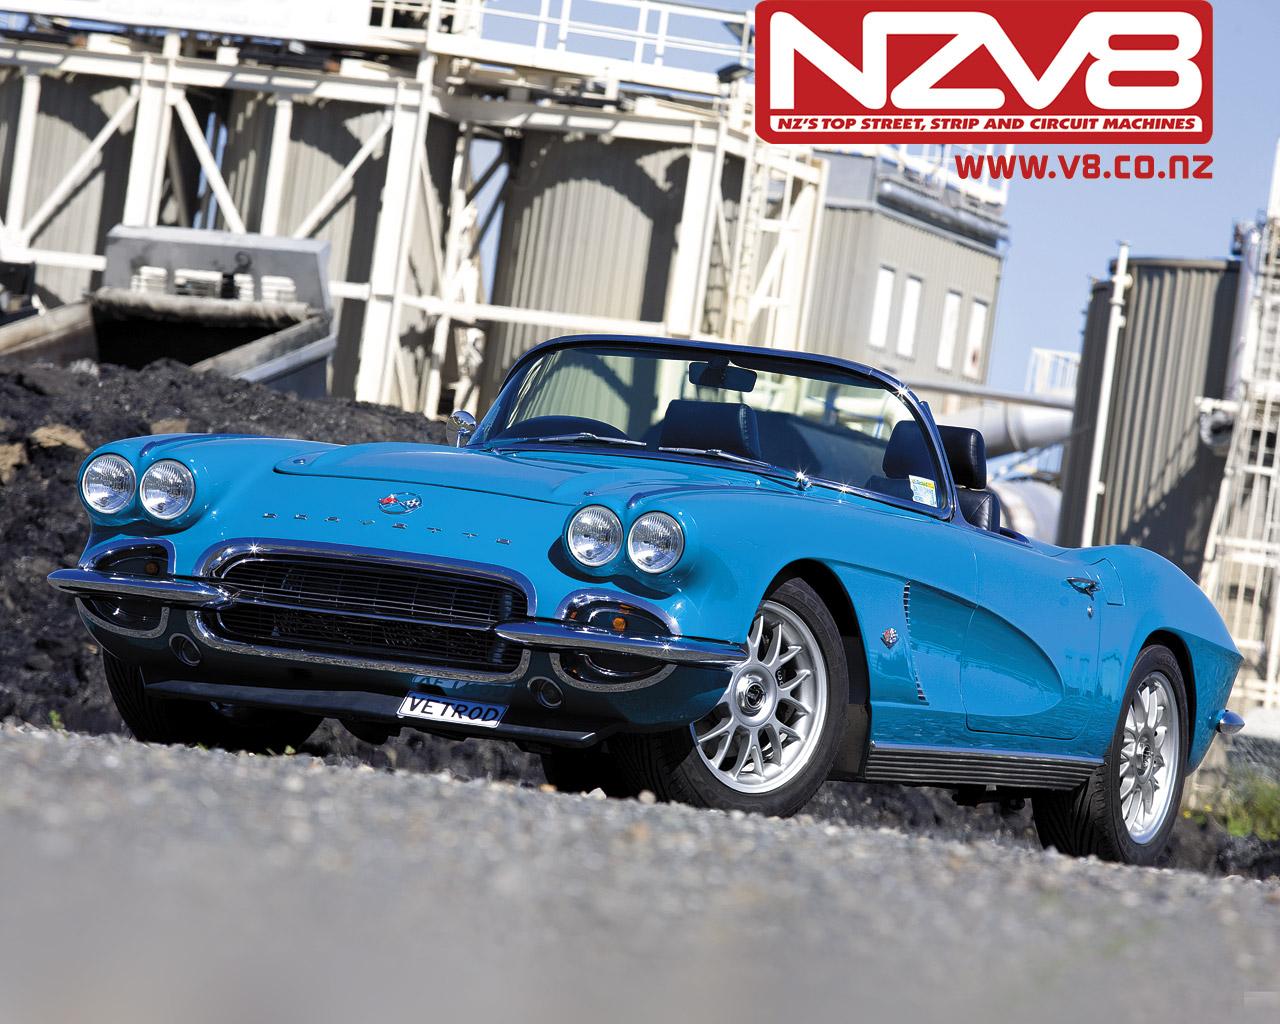 Corvette-normal2-1-